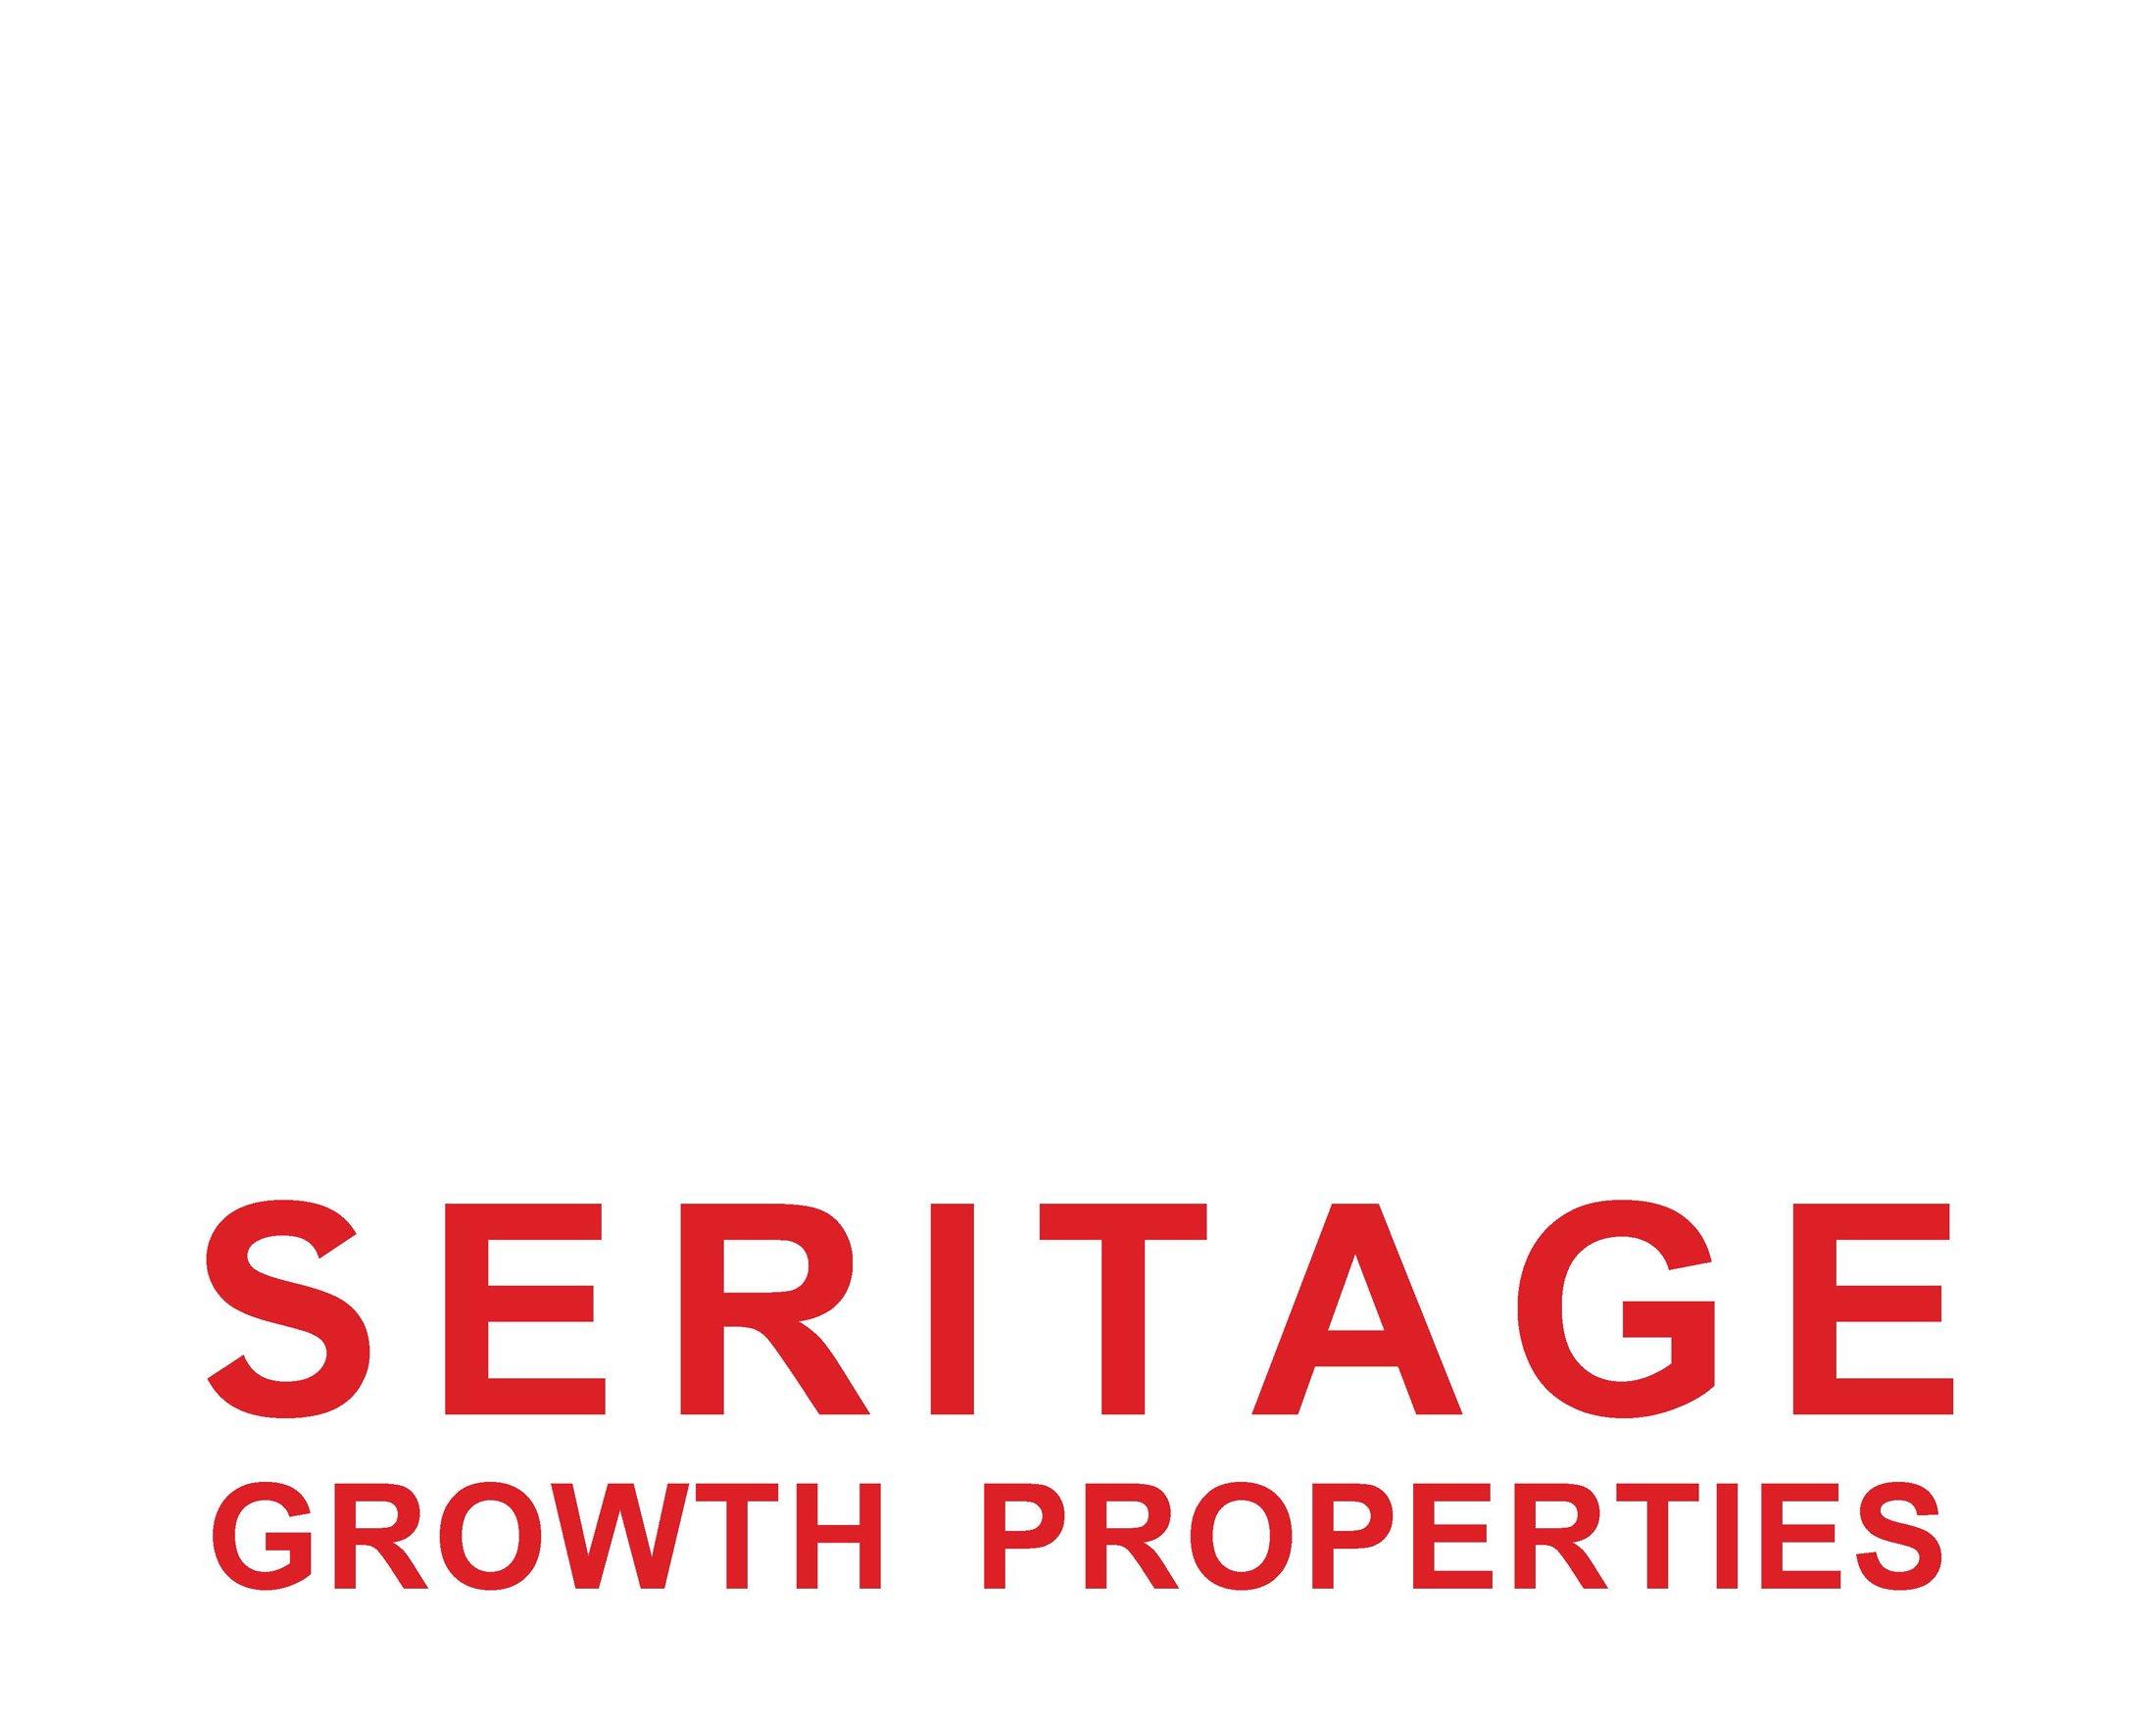 Seritage Growth Properties logo